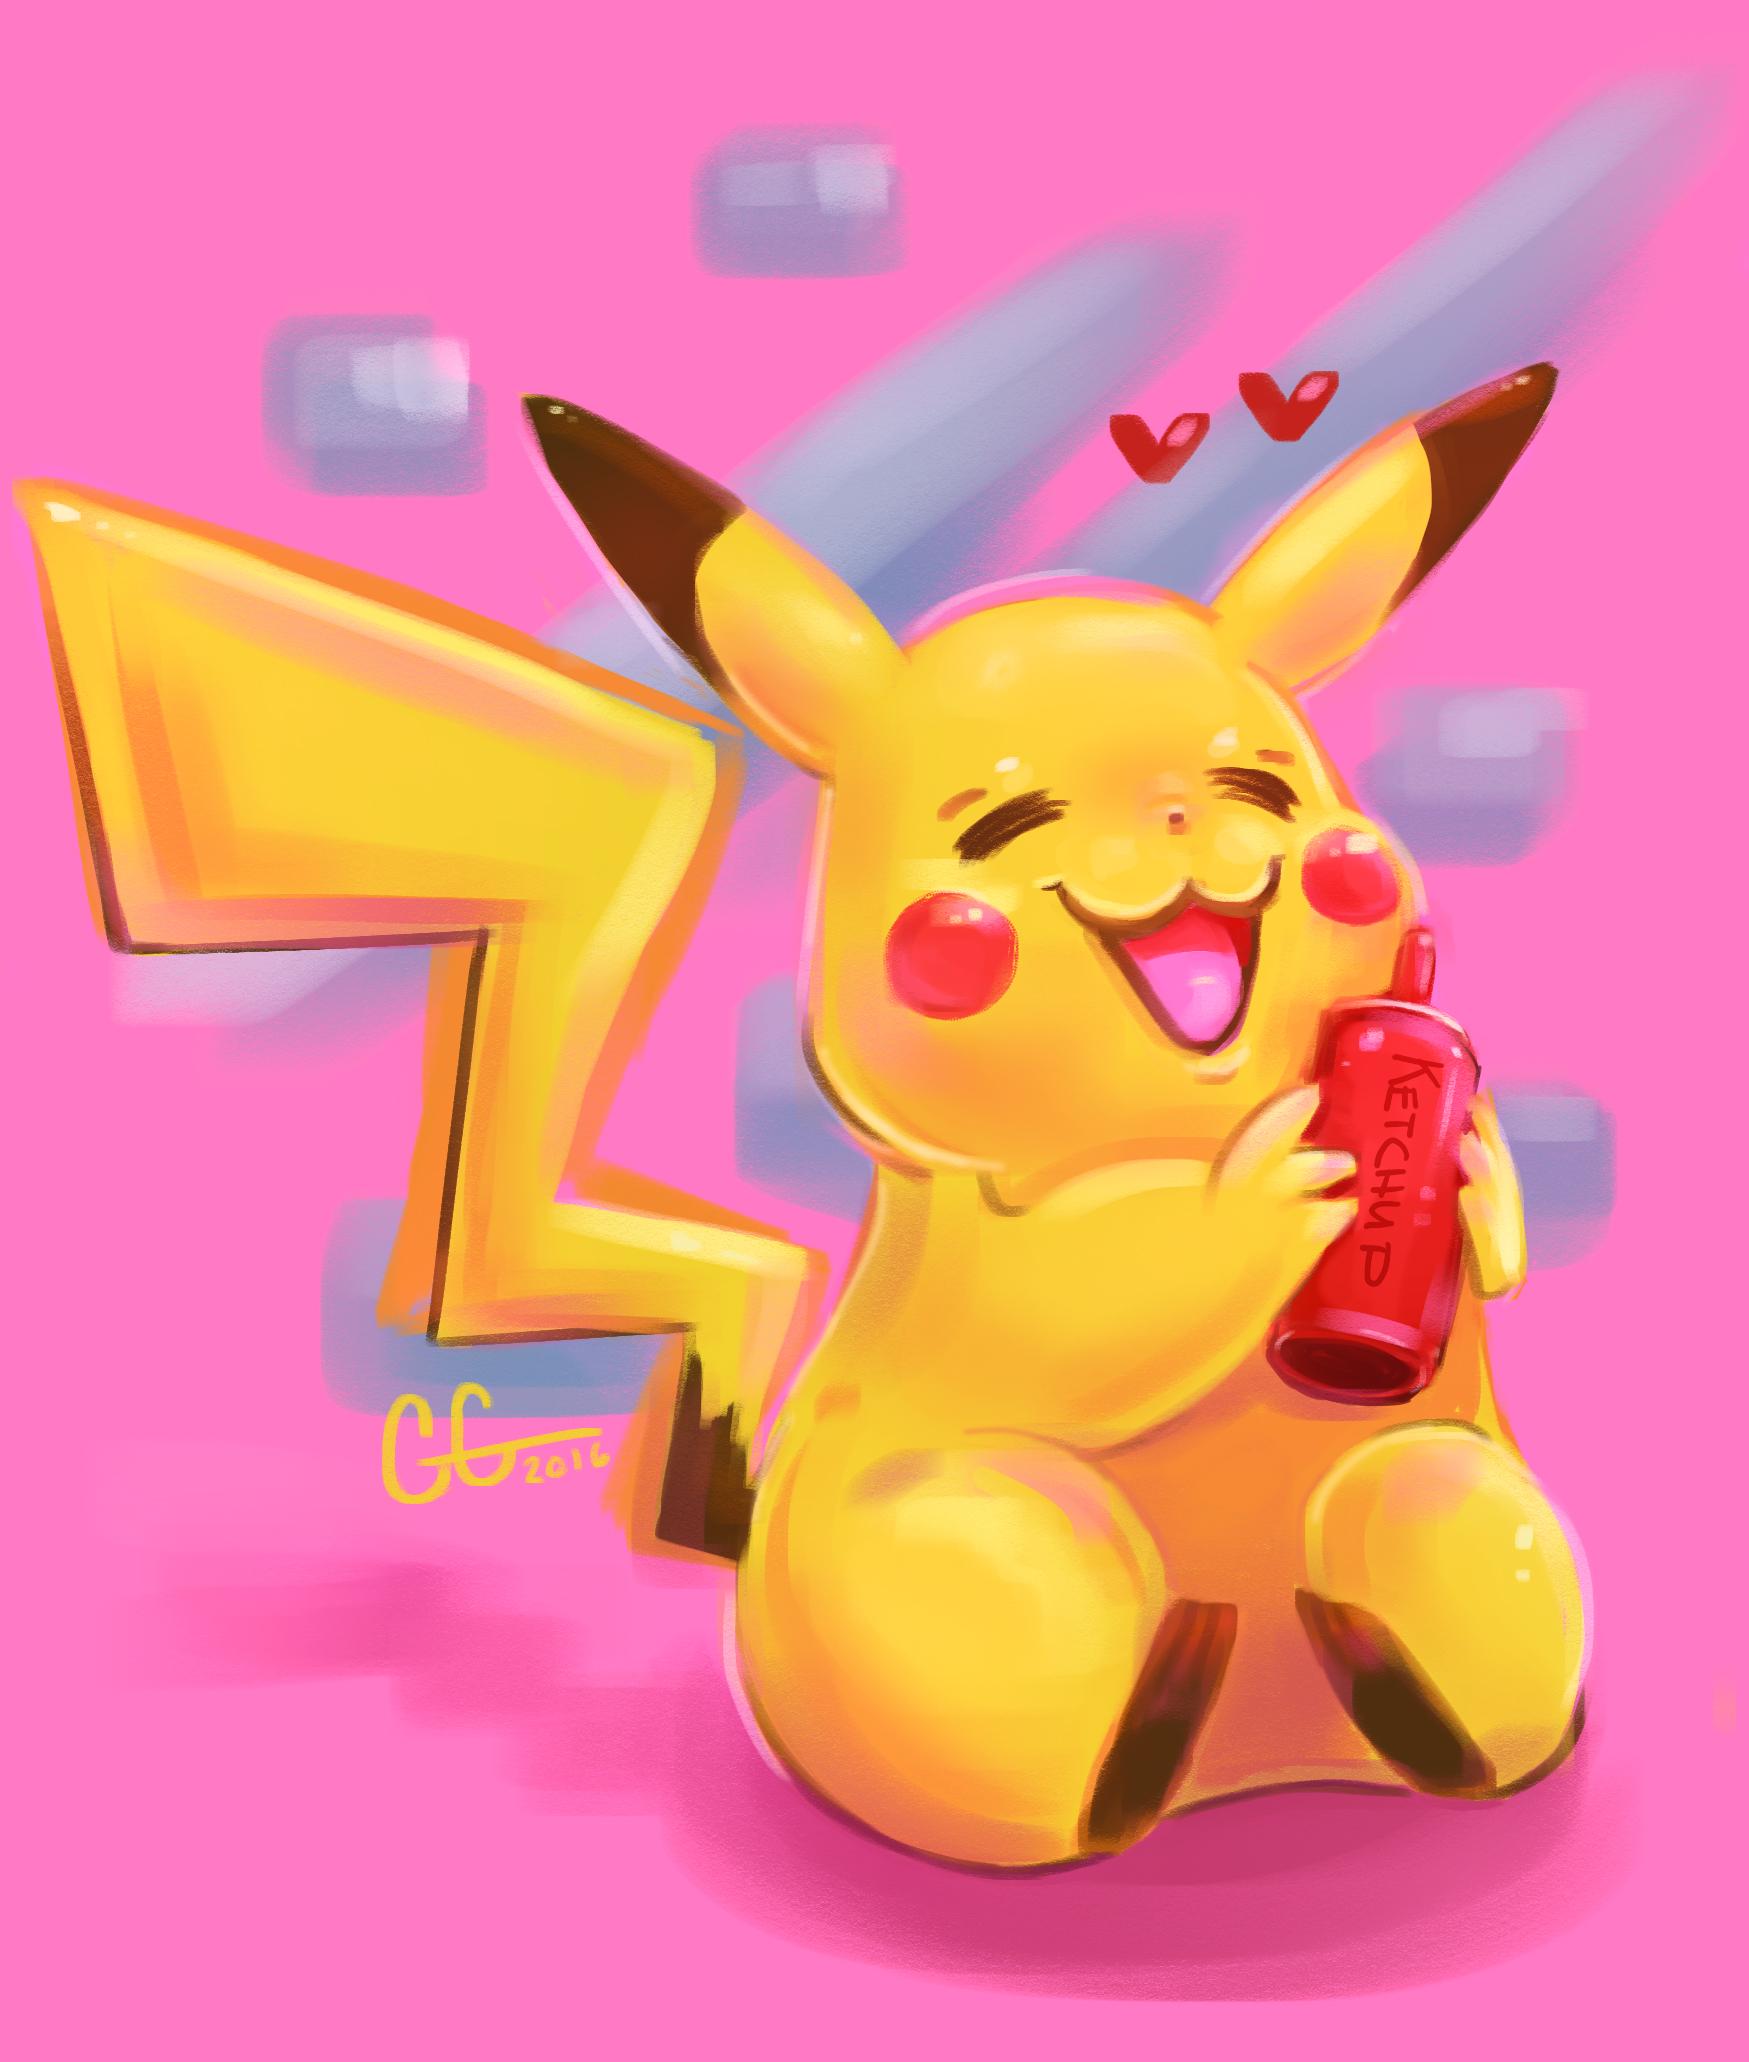 Pika Pika Pikachu!